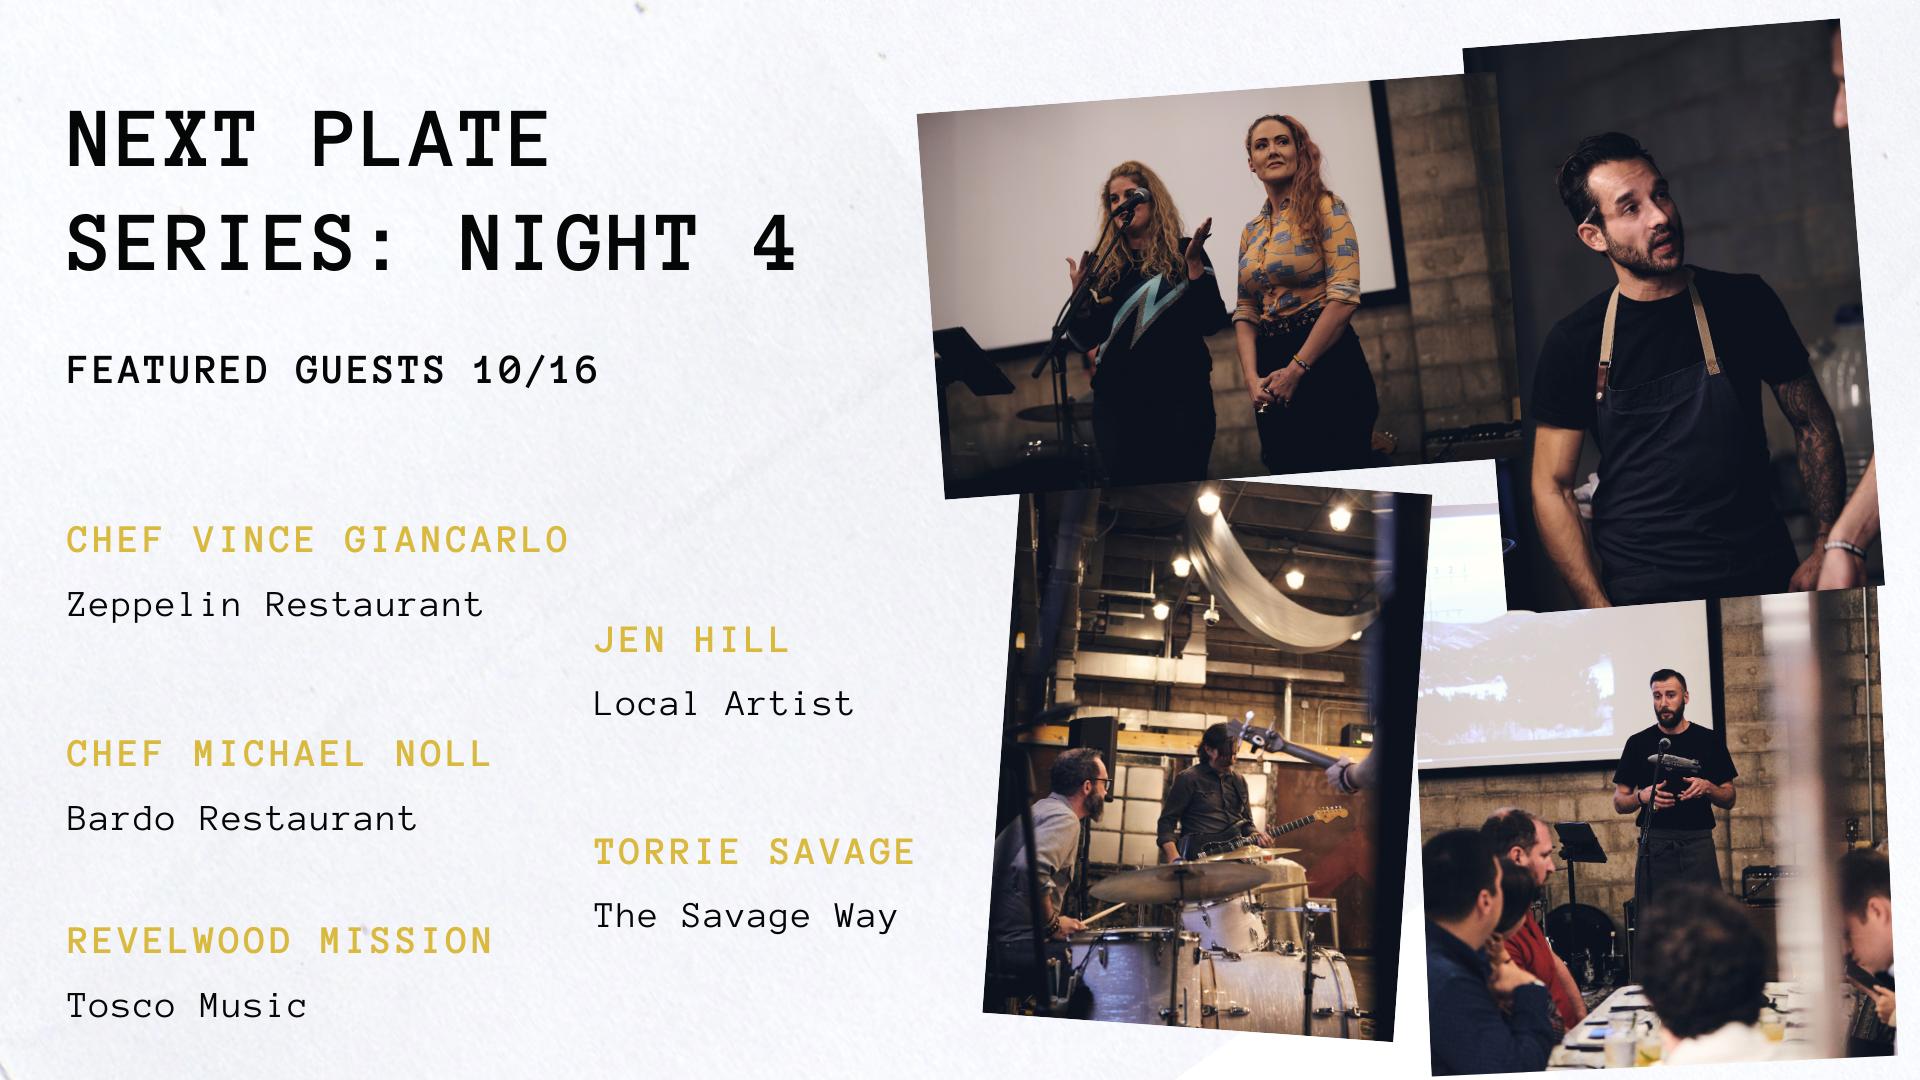 Night 4: Next Plate Series